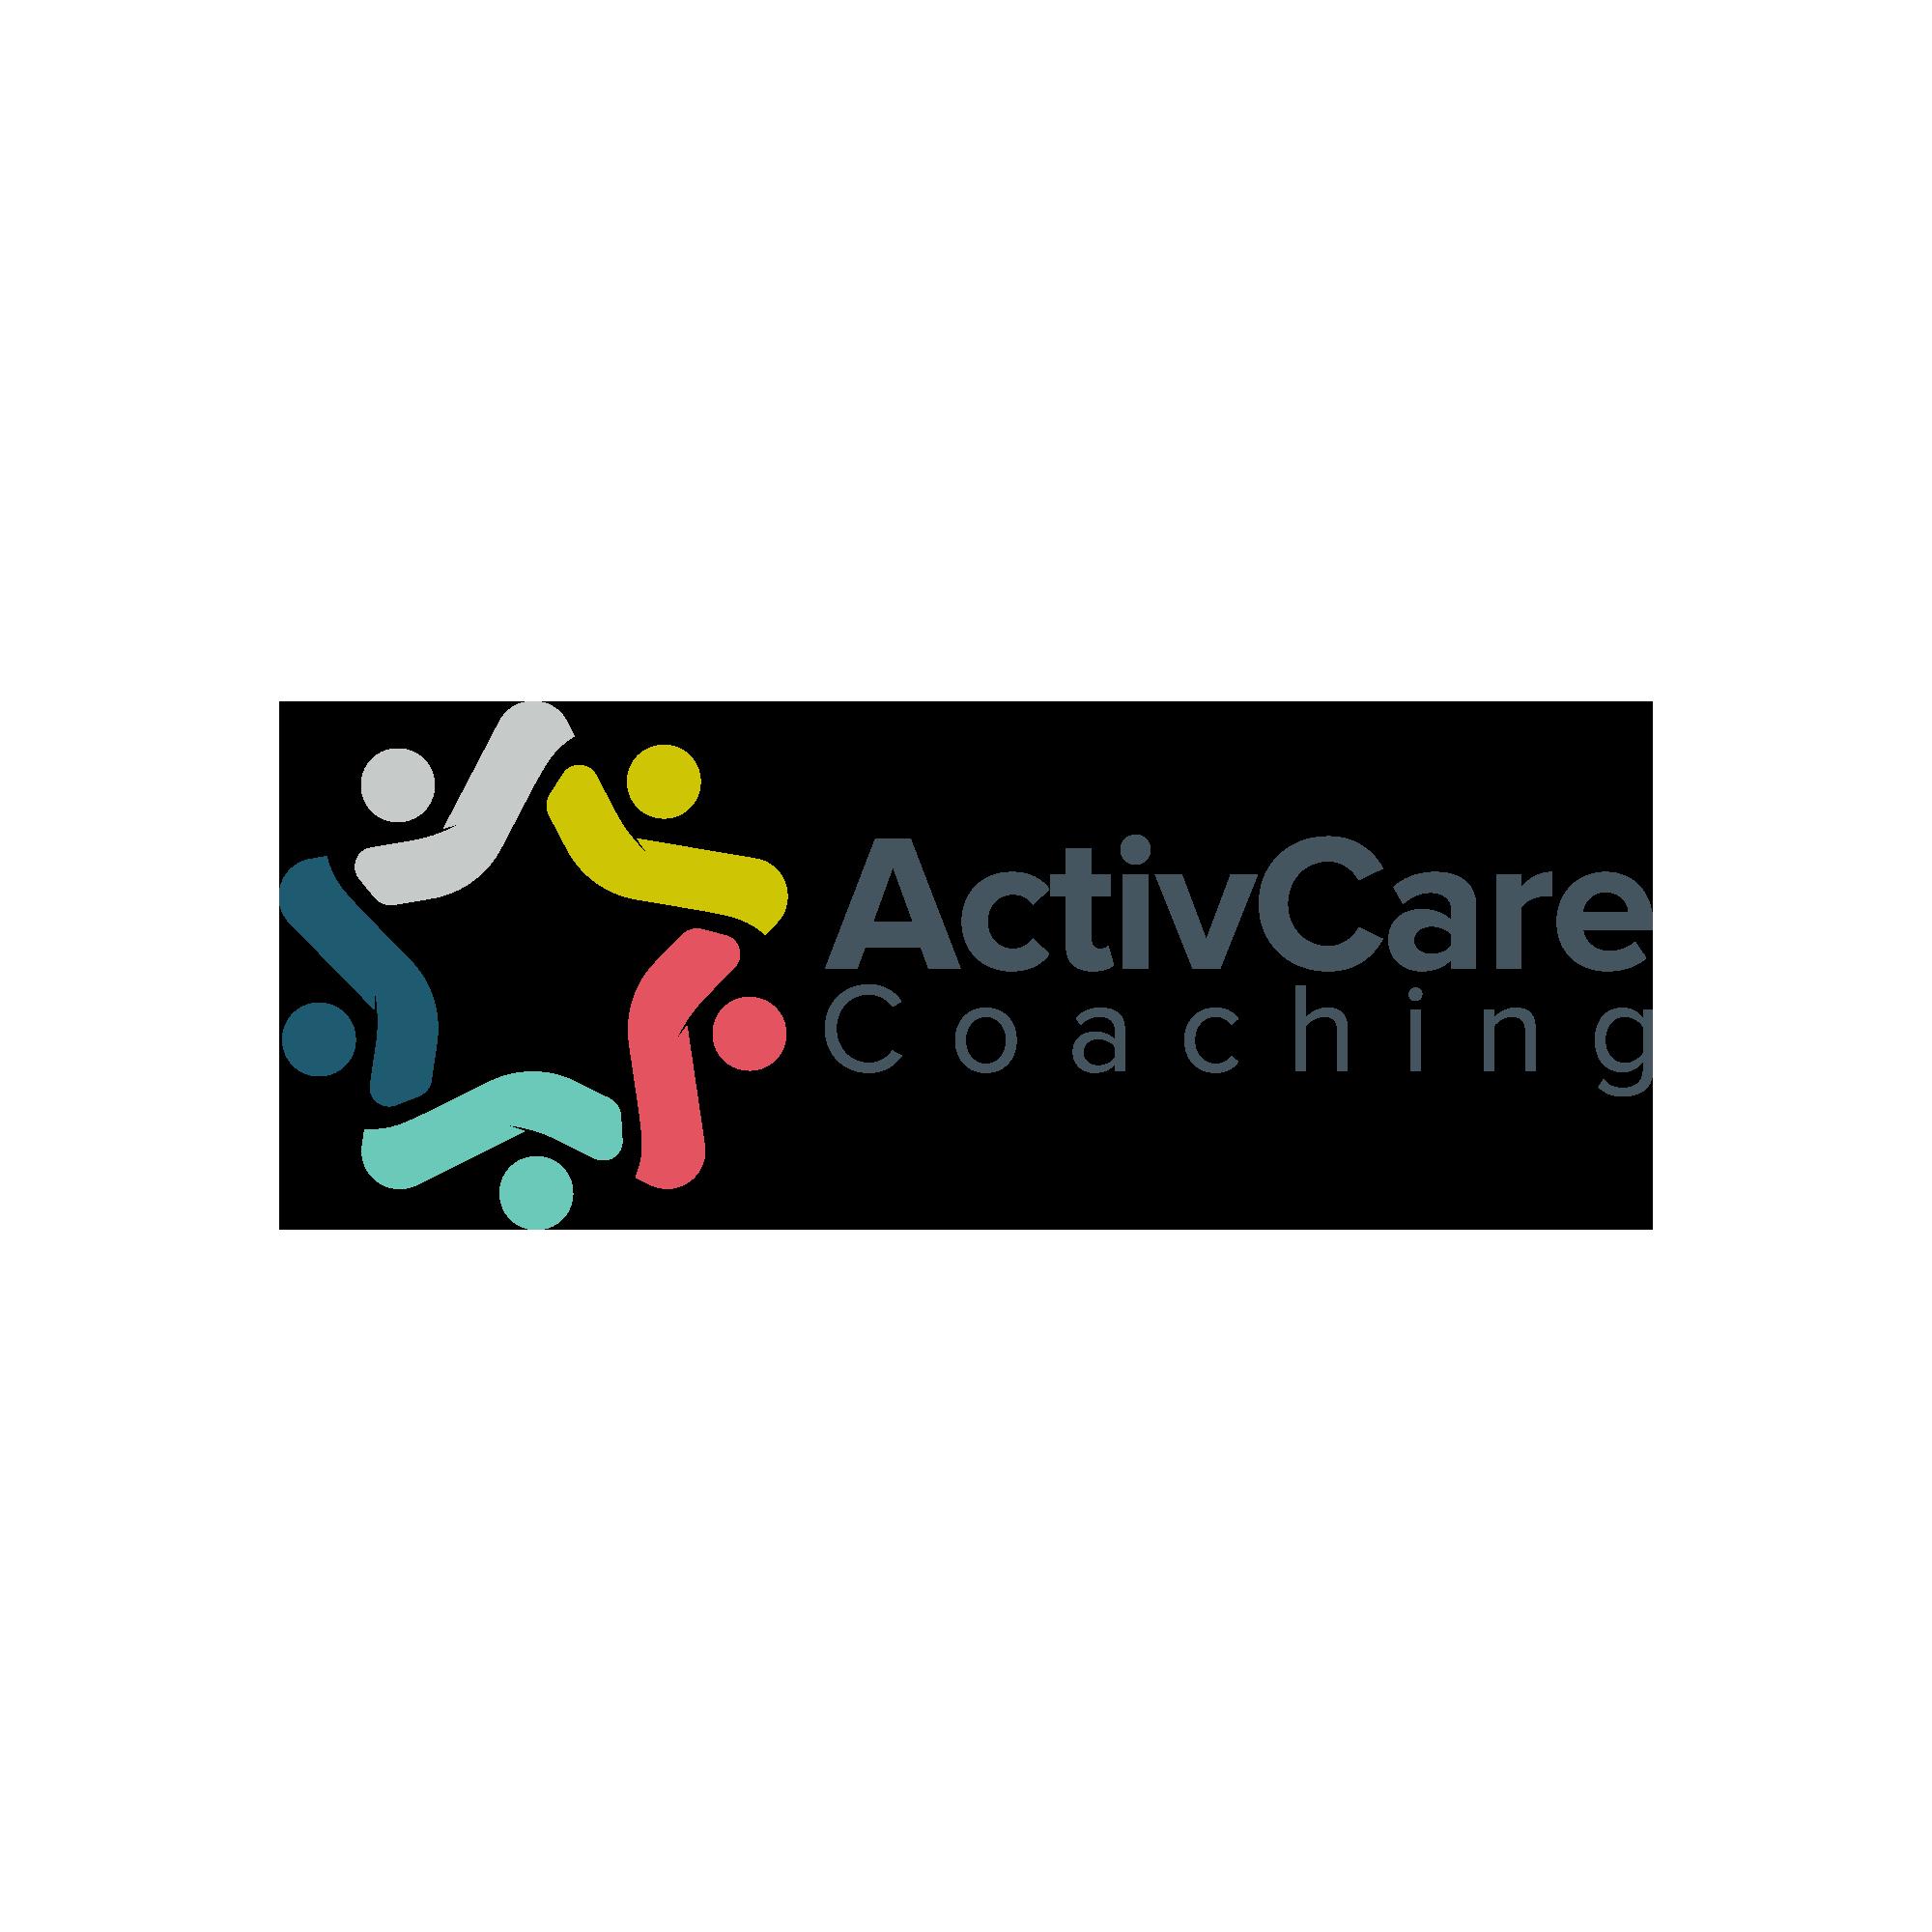 ActivCare Coaching